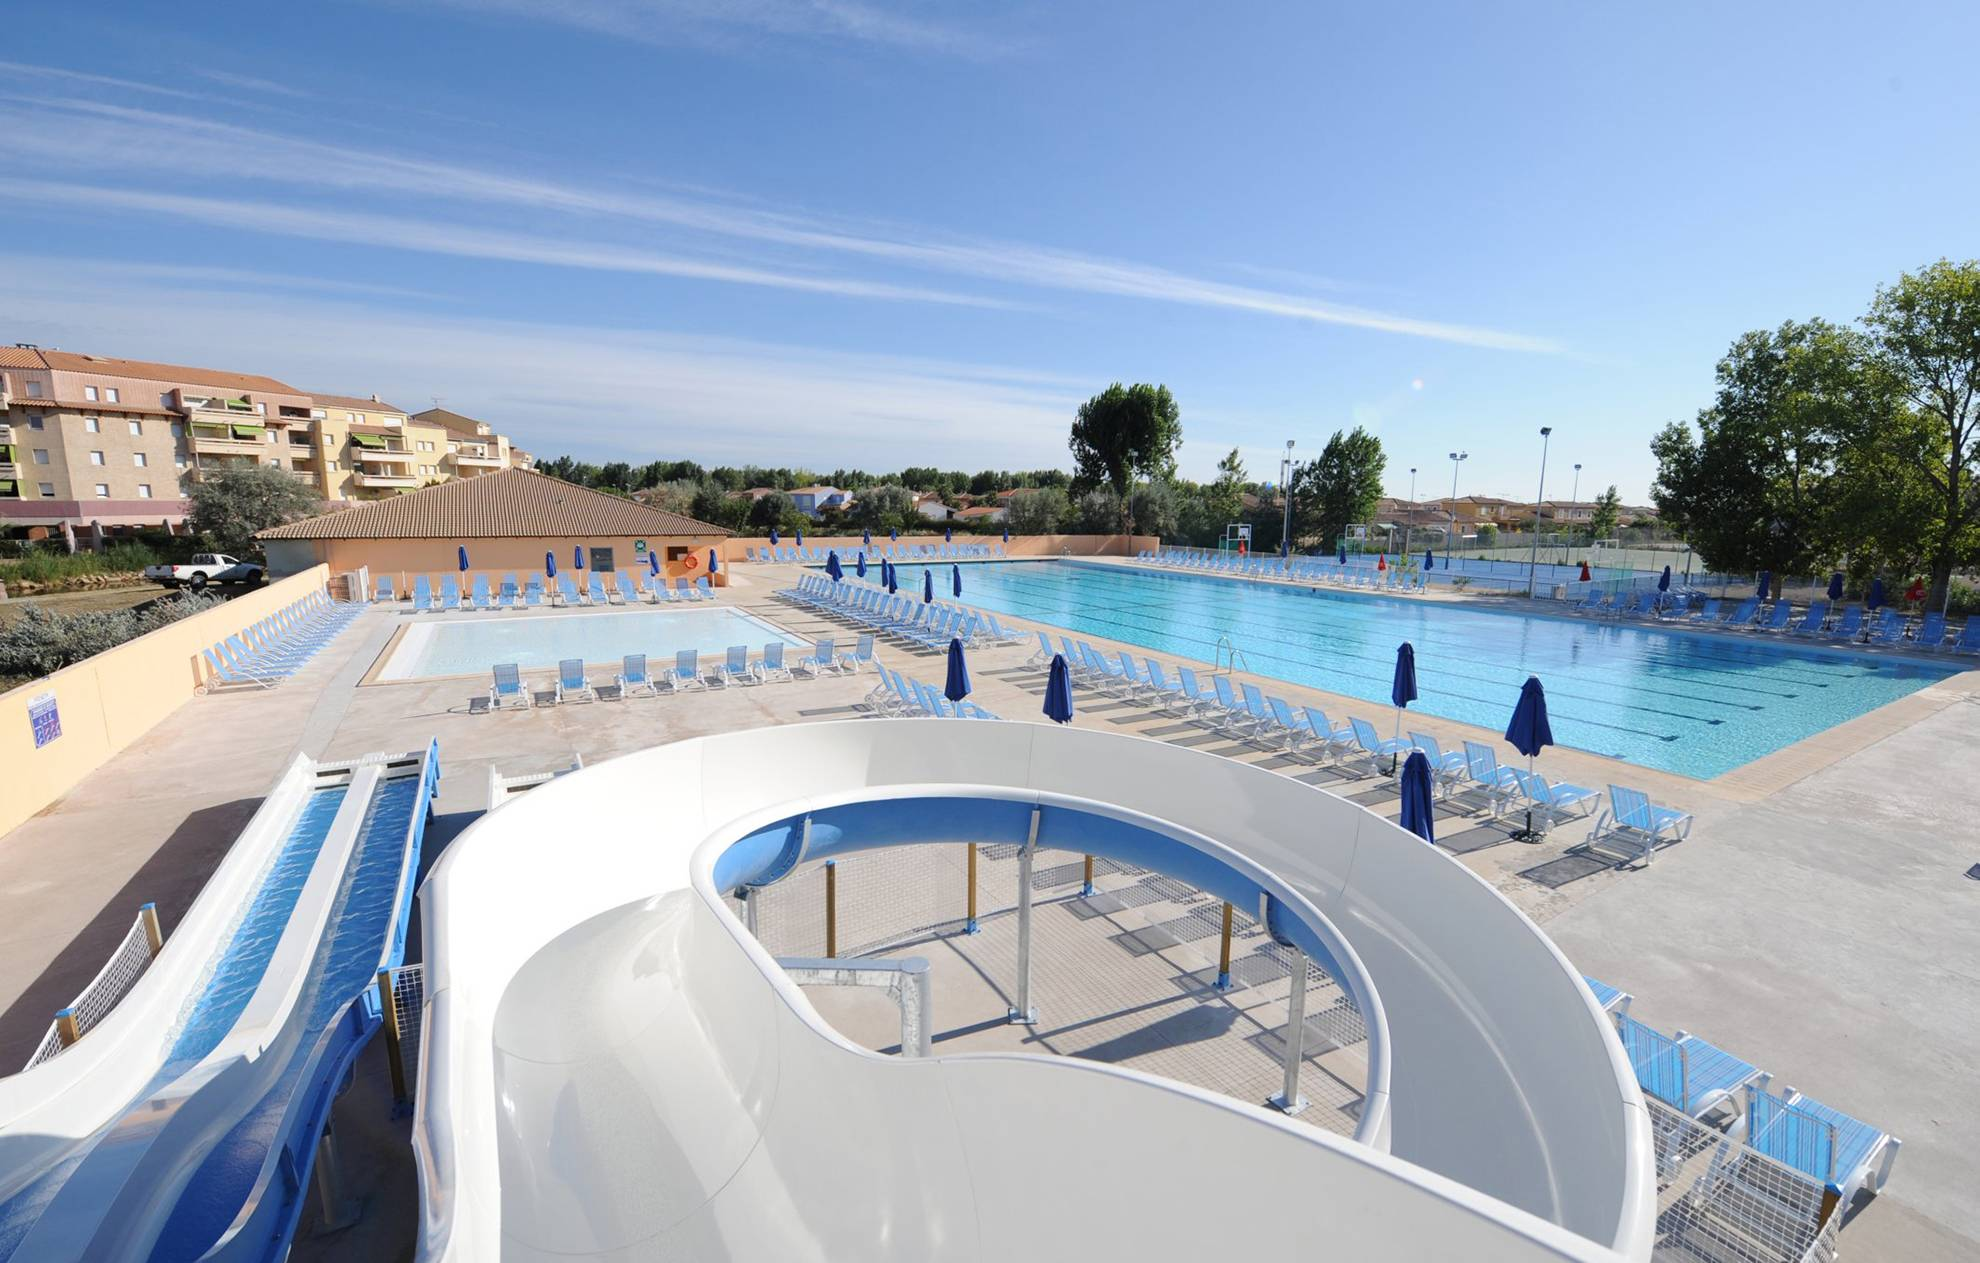 Location la mer vos vacances en bord de mer odalys - Hotel le grau du roi avec piscine ...